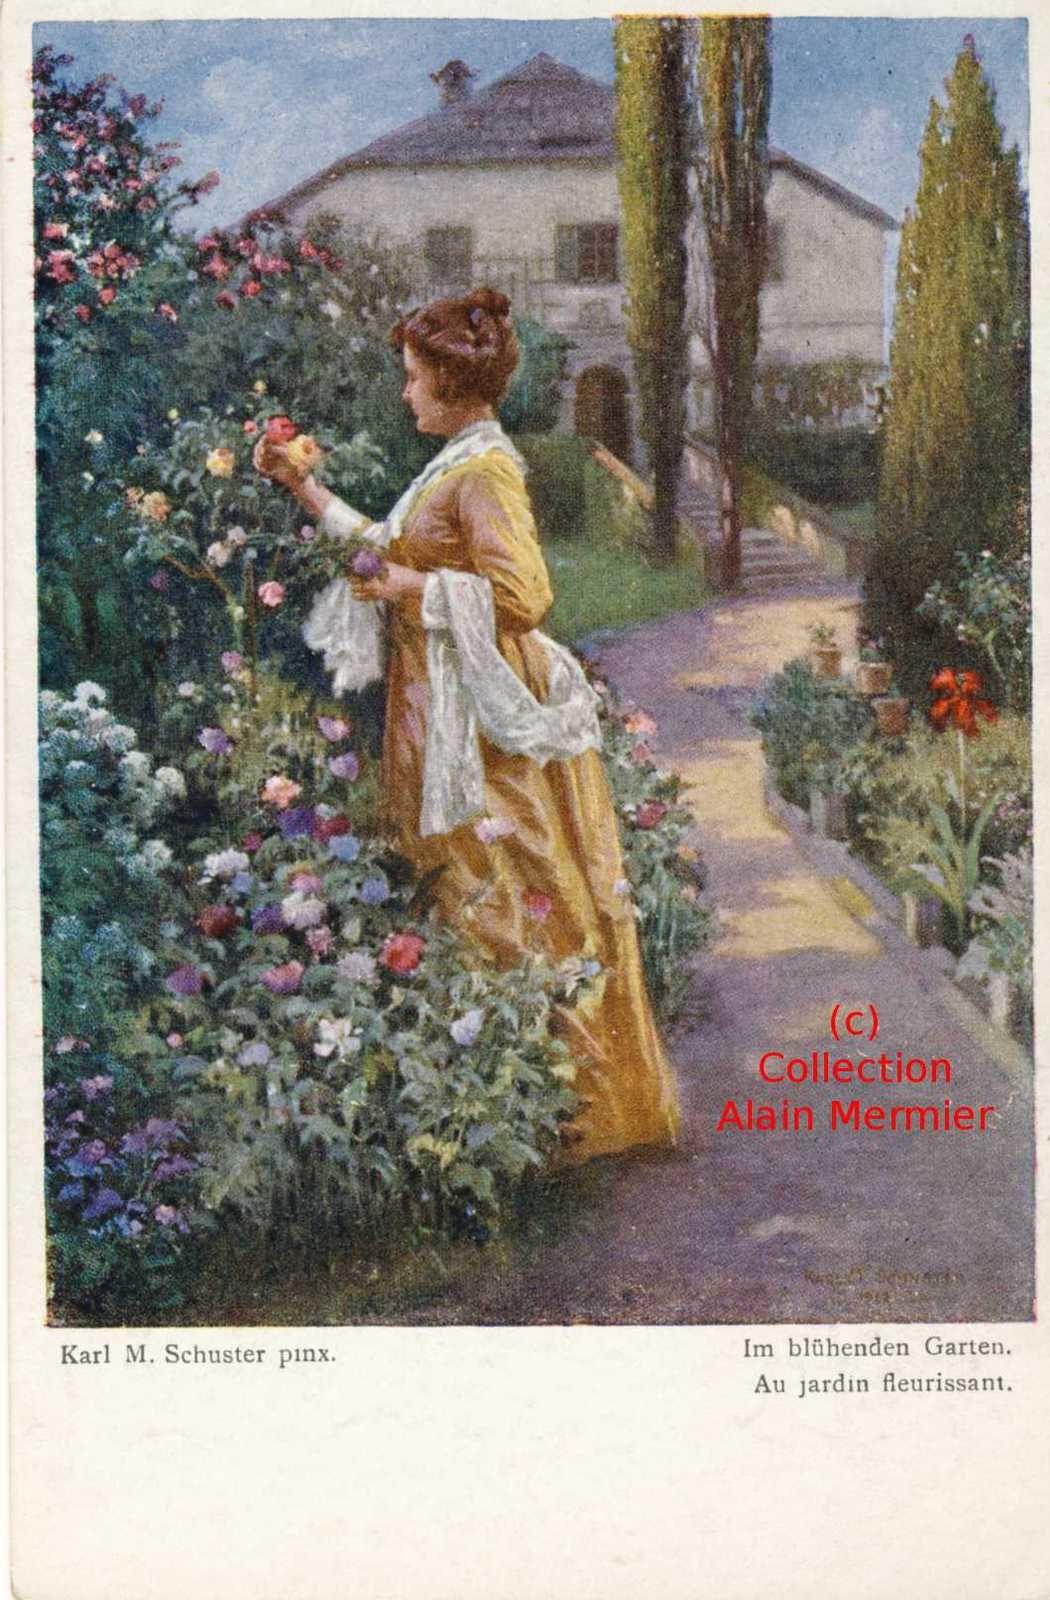 Iris -3517- Illustrateur SCHUSTER Karl : Au jardin fleurissant. Allemagne.